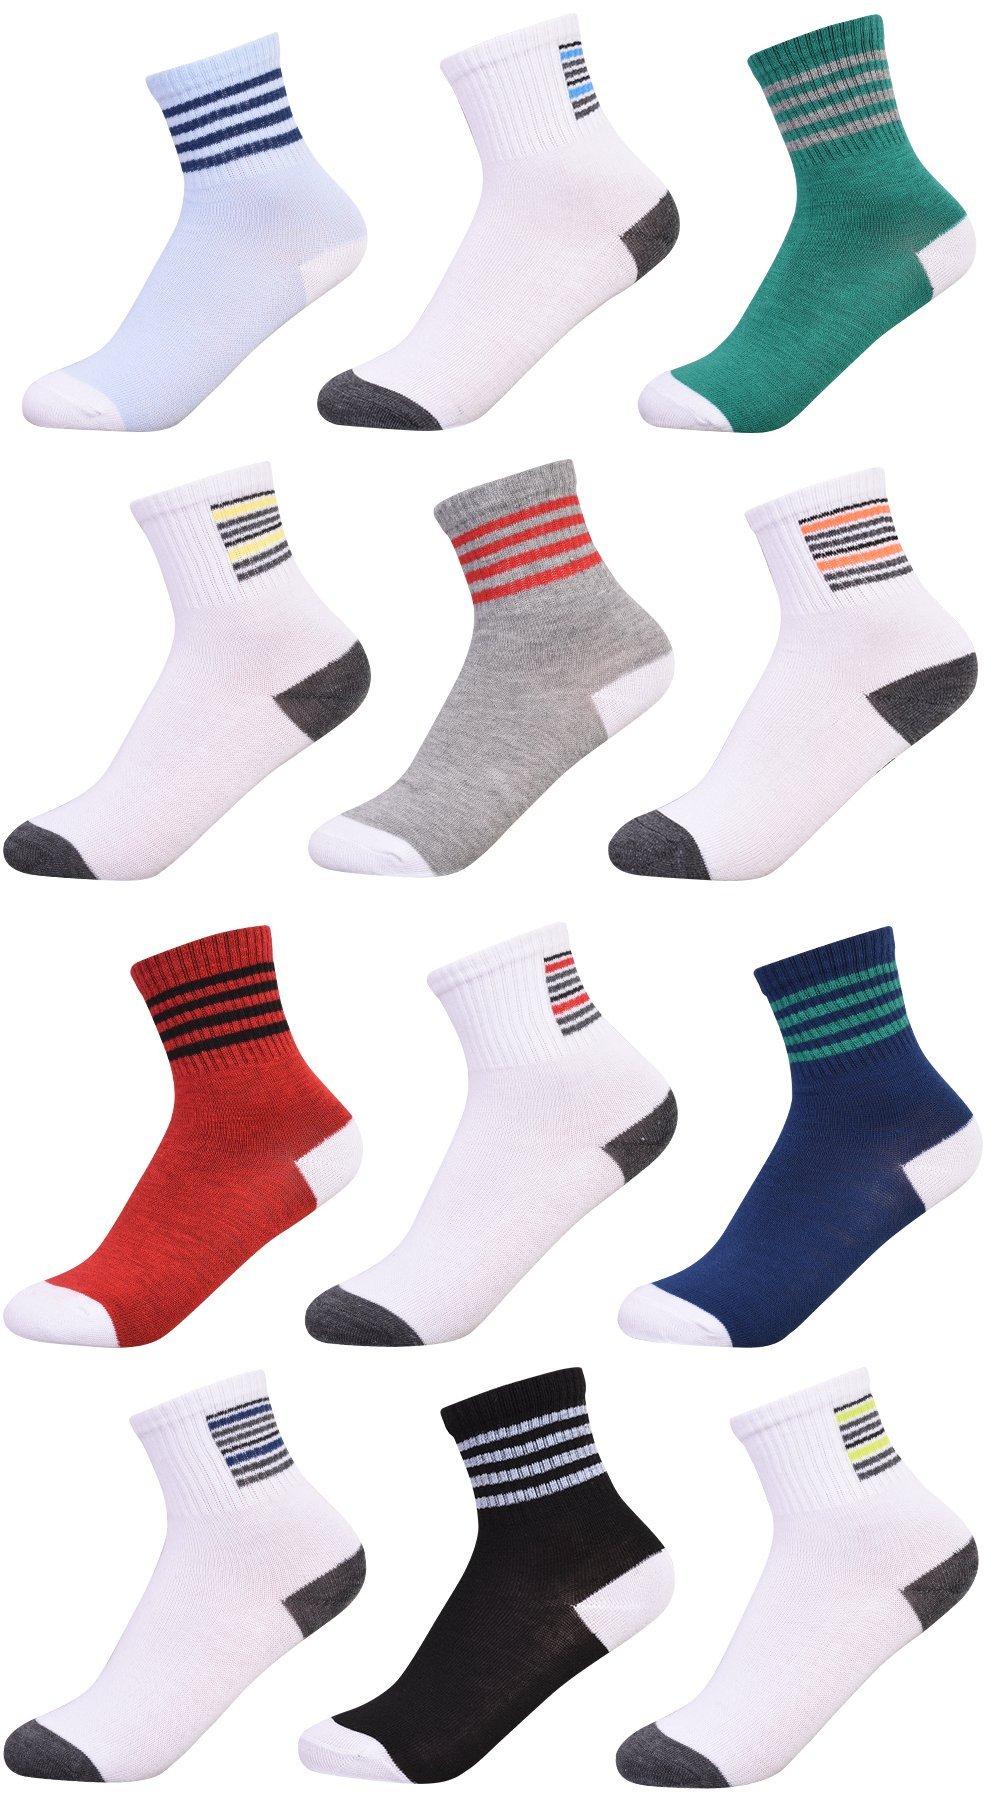 'Heelys Boys 12 Pack Crew Socks, Light Multi, Size 9-11'